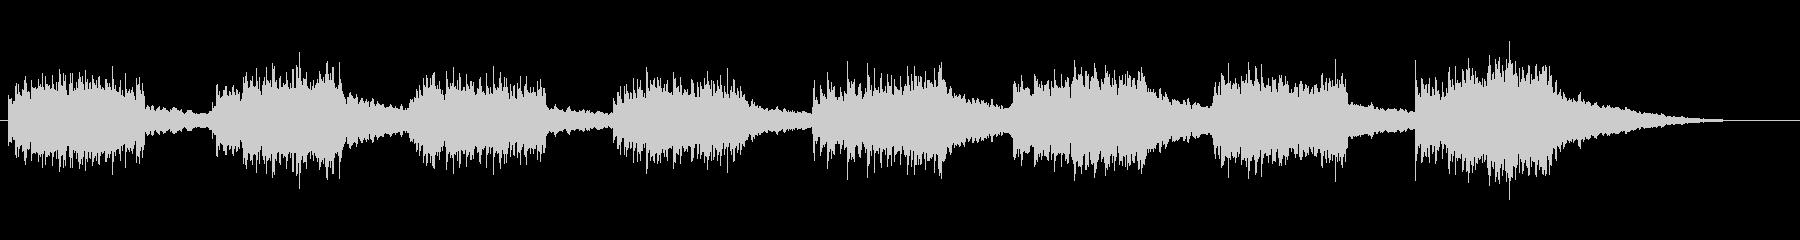 KANTアラームベルサウンド285の未再生の波形